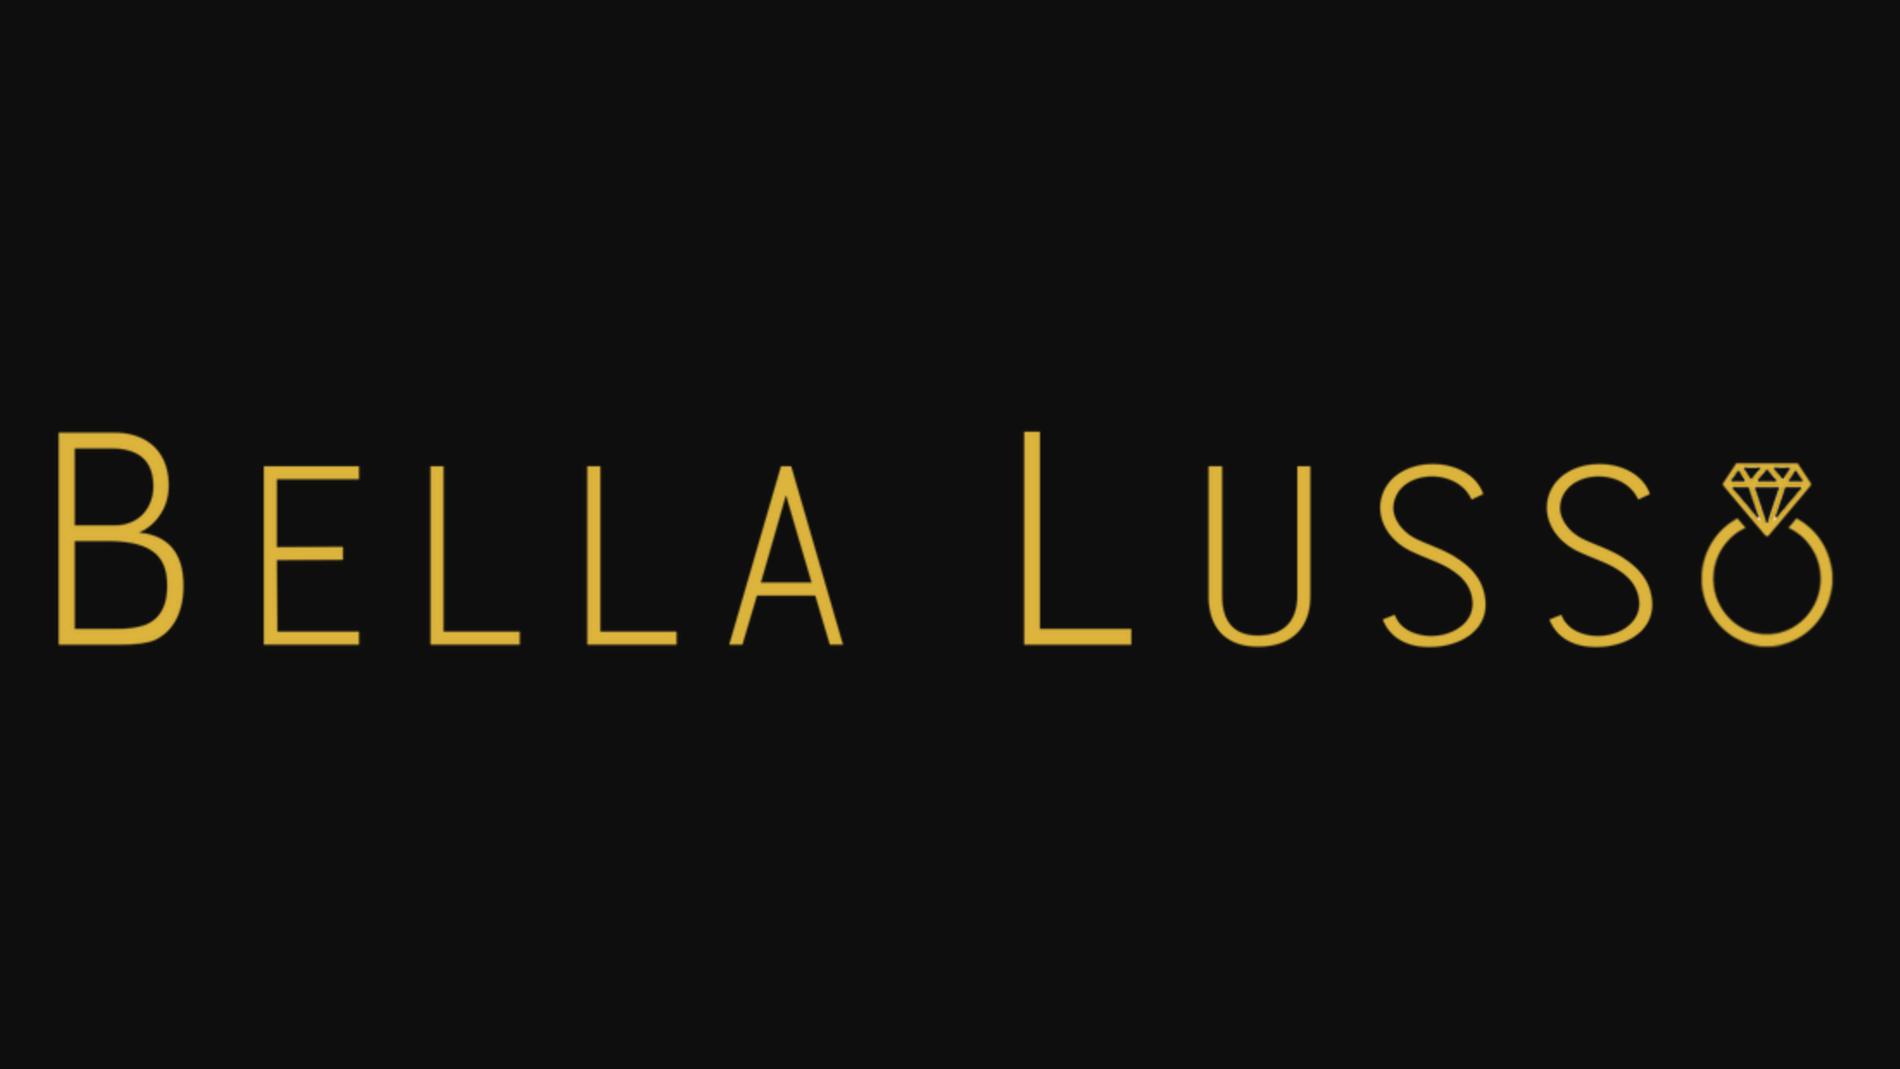 Bella Lusso